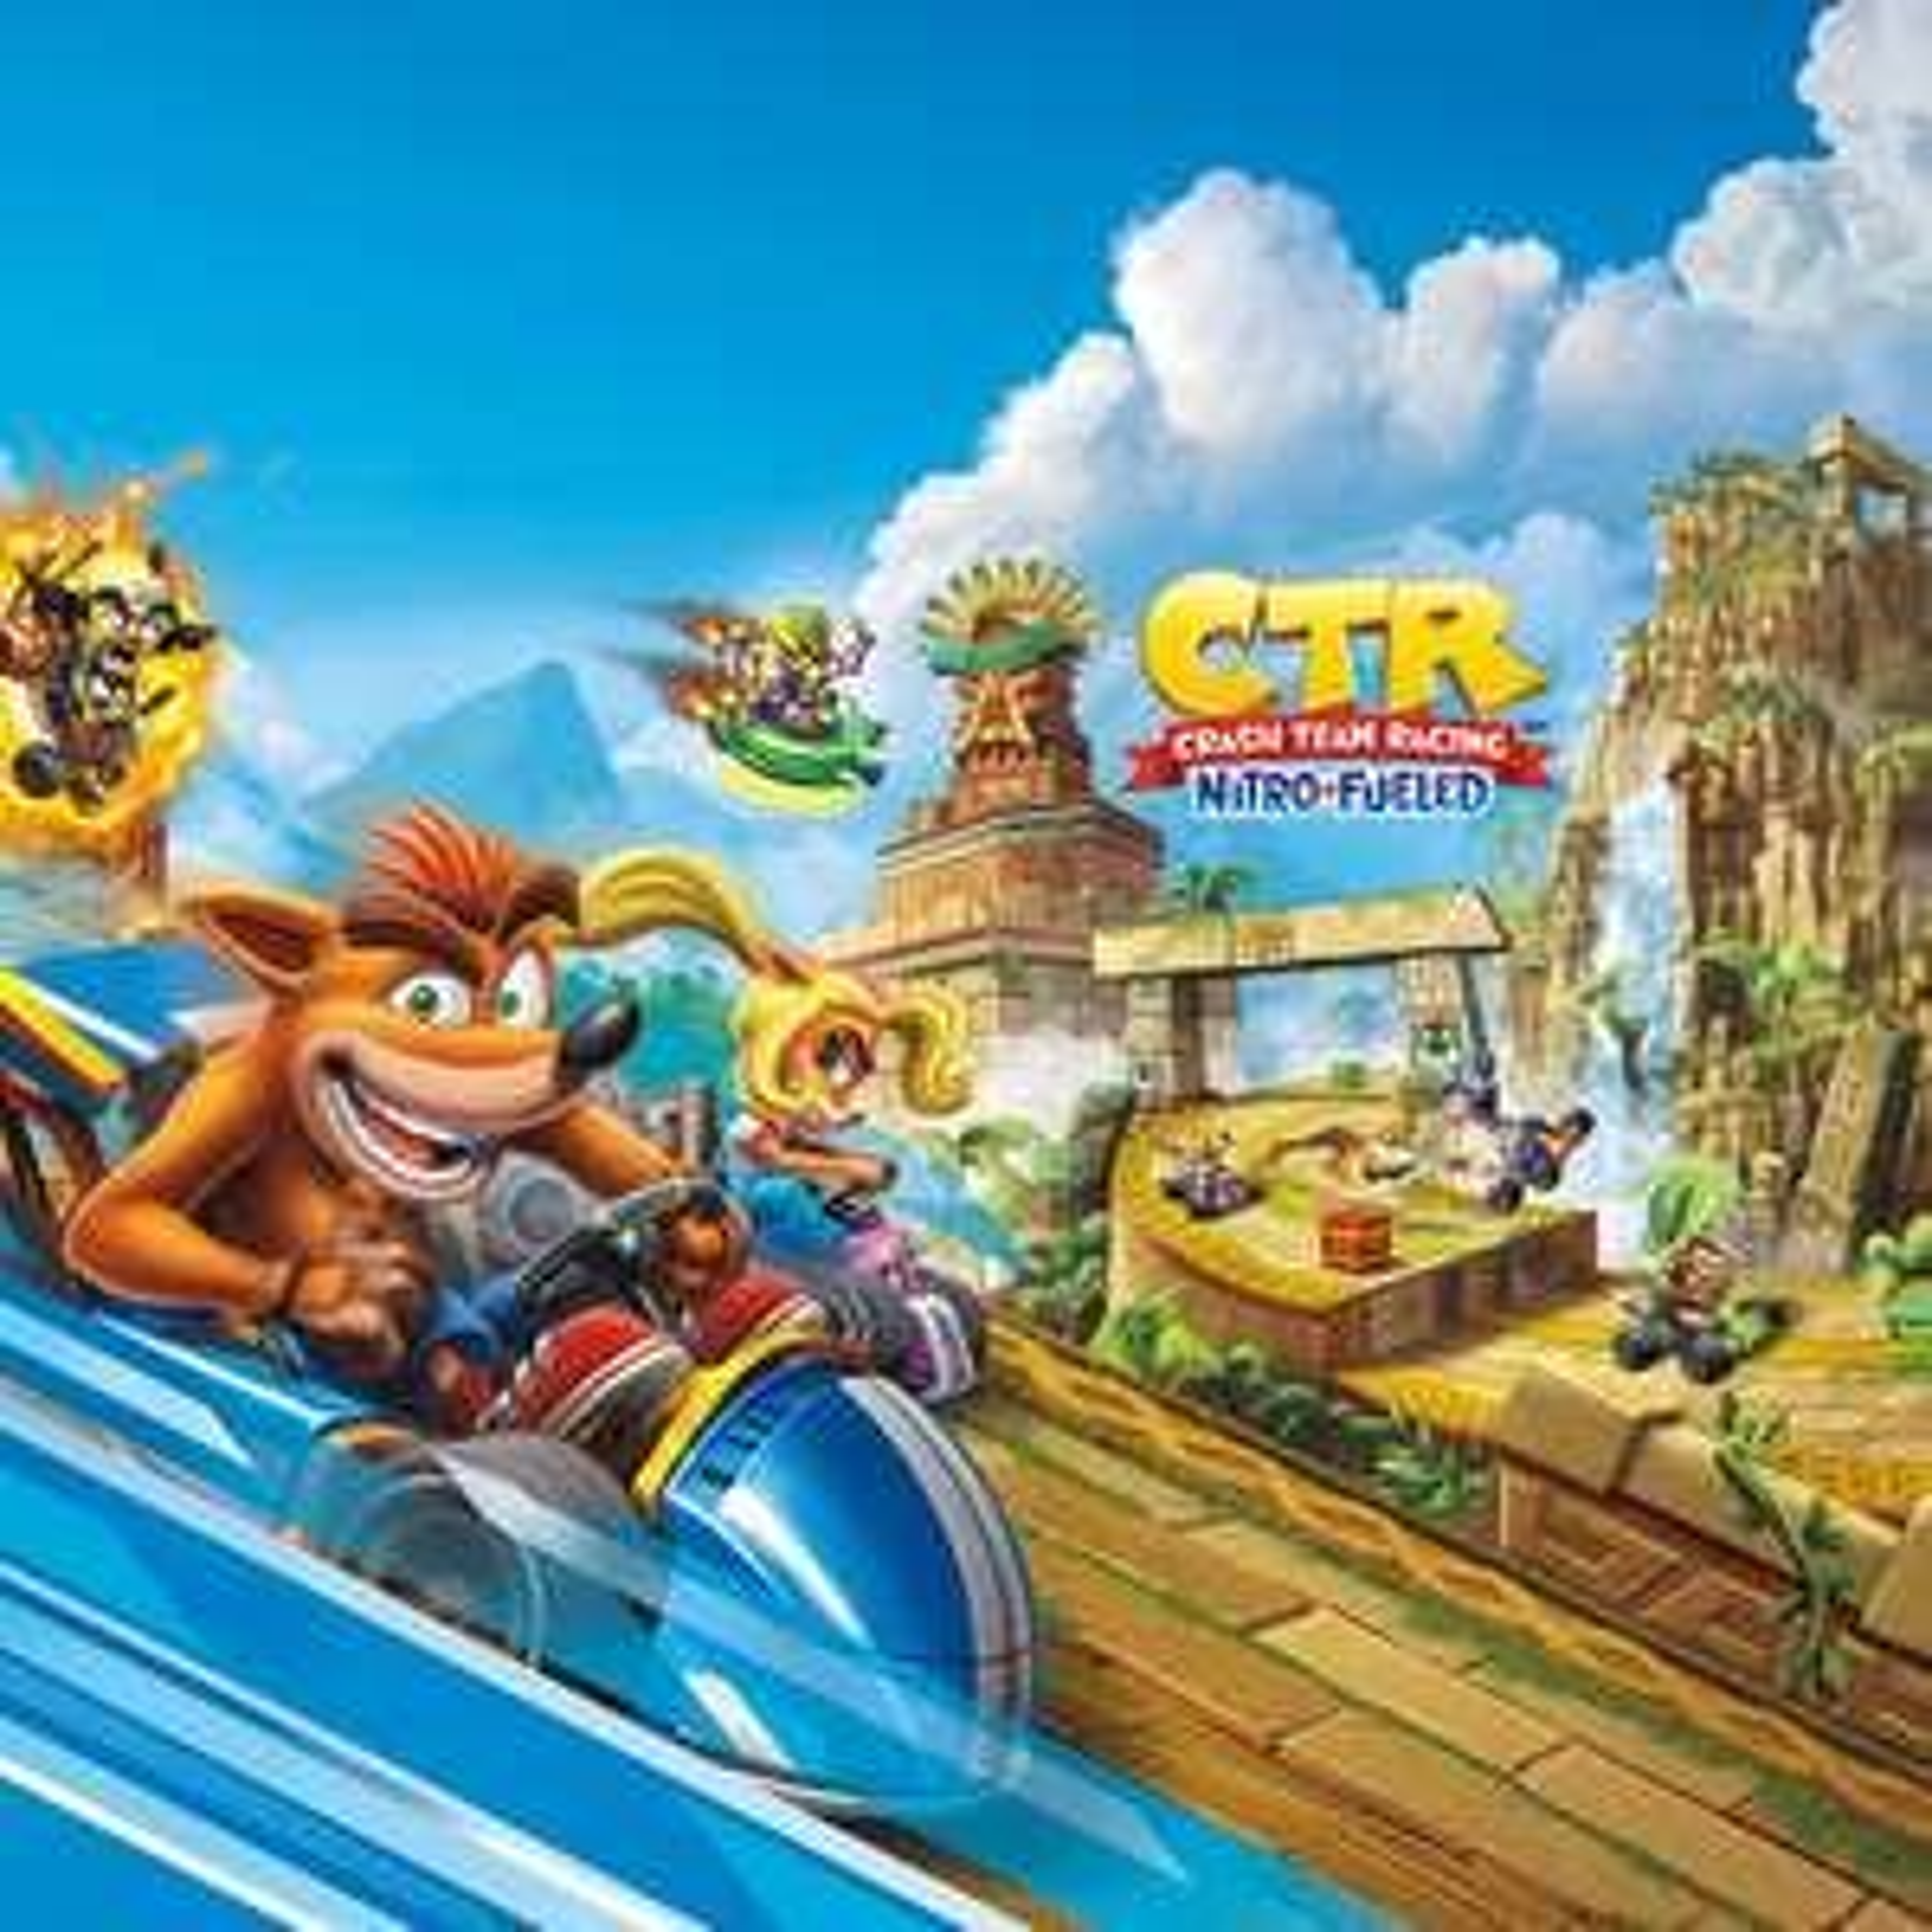 PS4 - Crash Team Racing Nitro-Fueled - Playstation Store